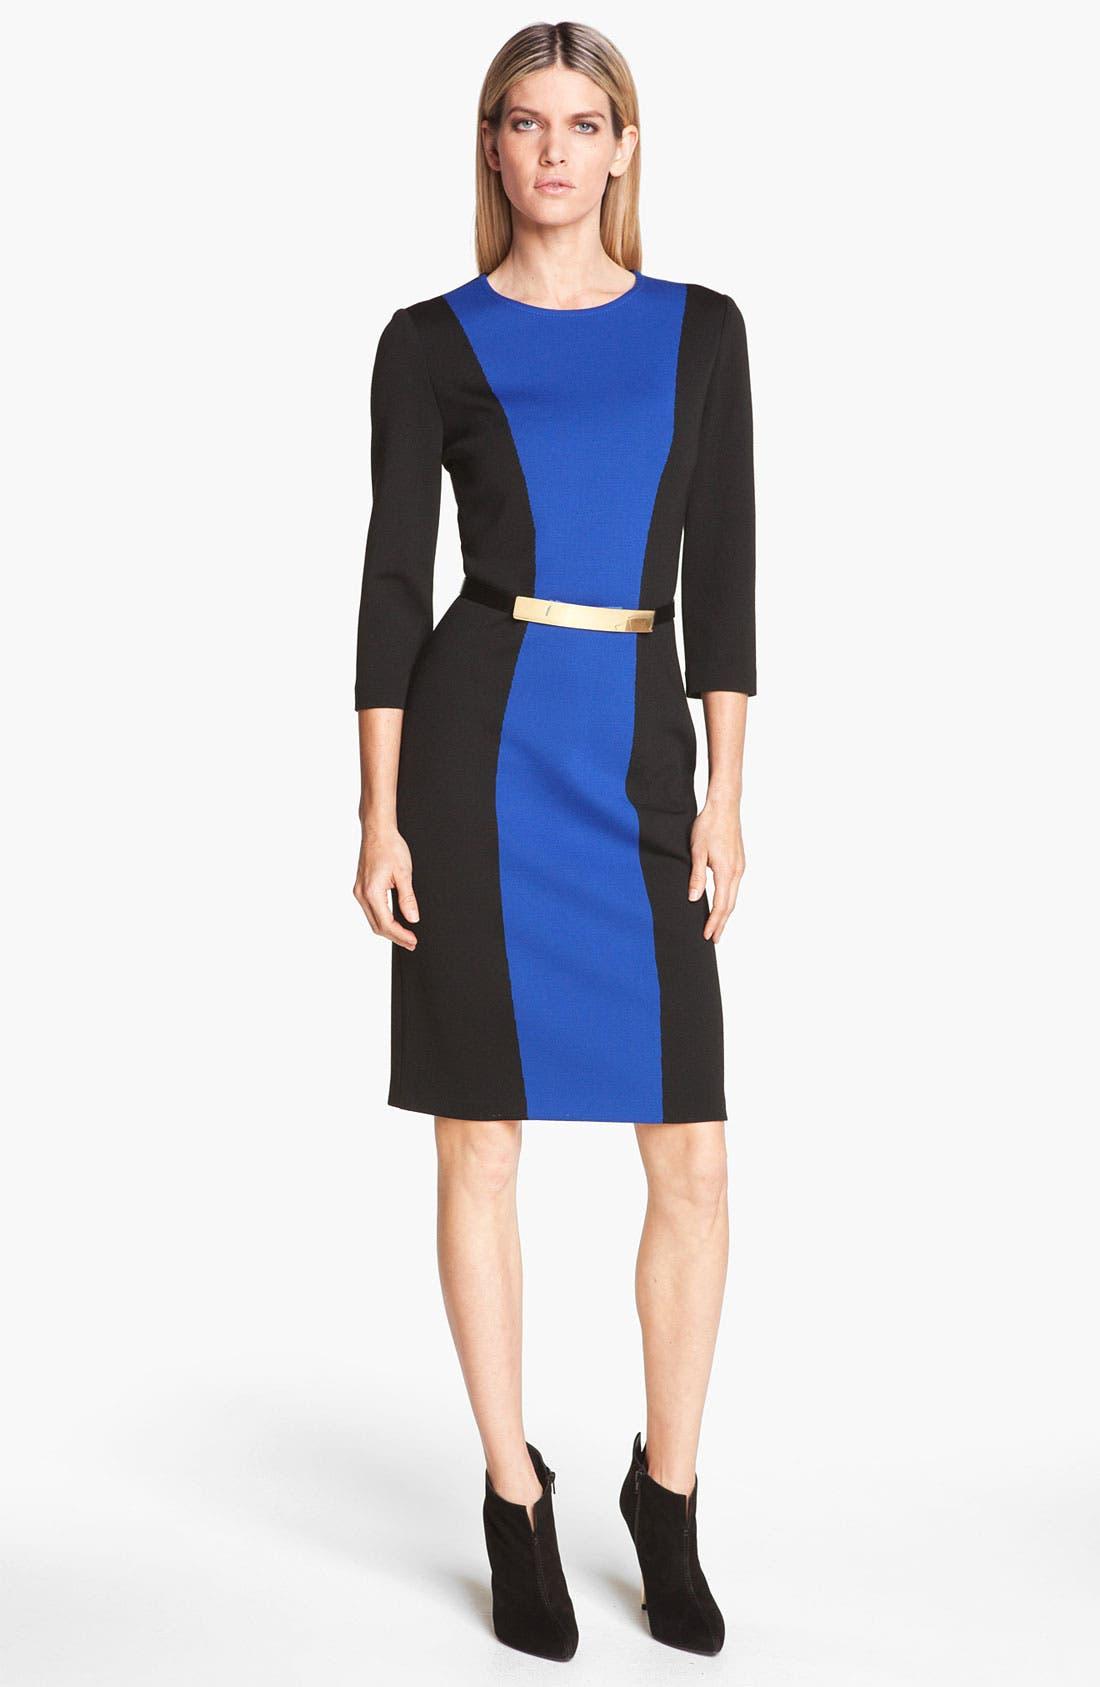 Main Image - St. John Collection Colorblock Milano Knit Dress